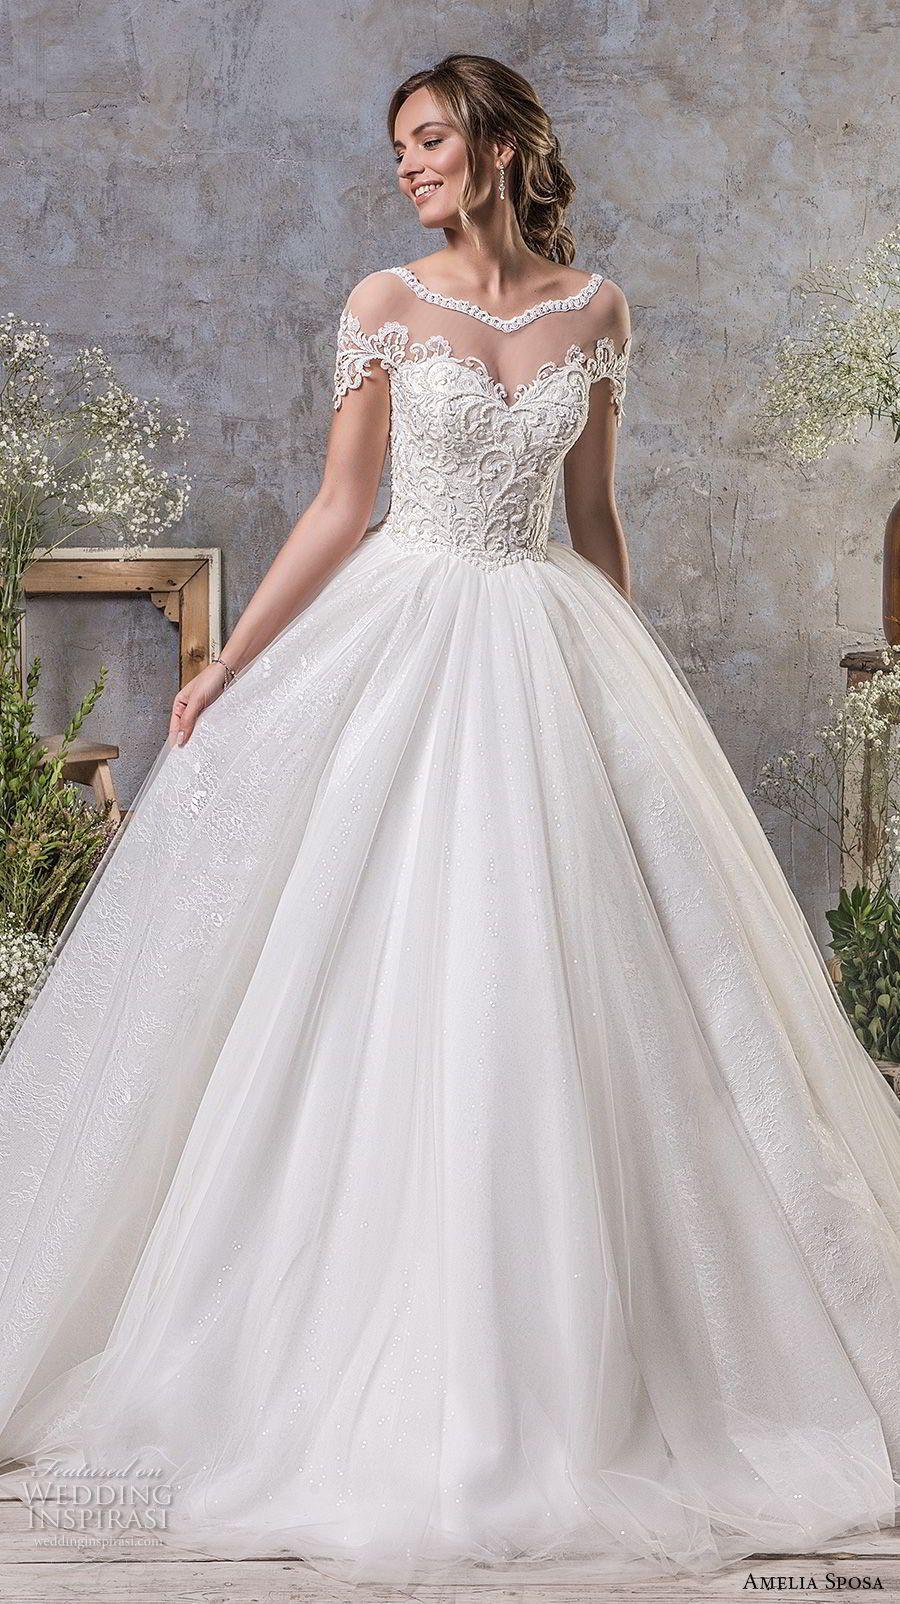 Amelia sposa fall bridal short sleeves illusion bateau